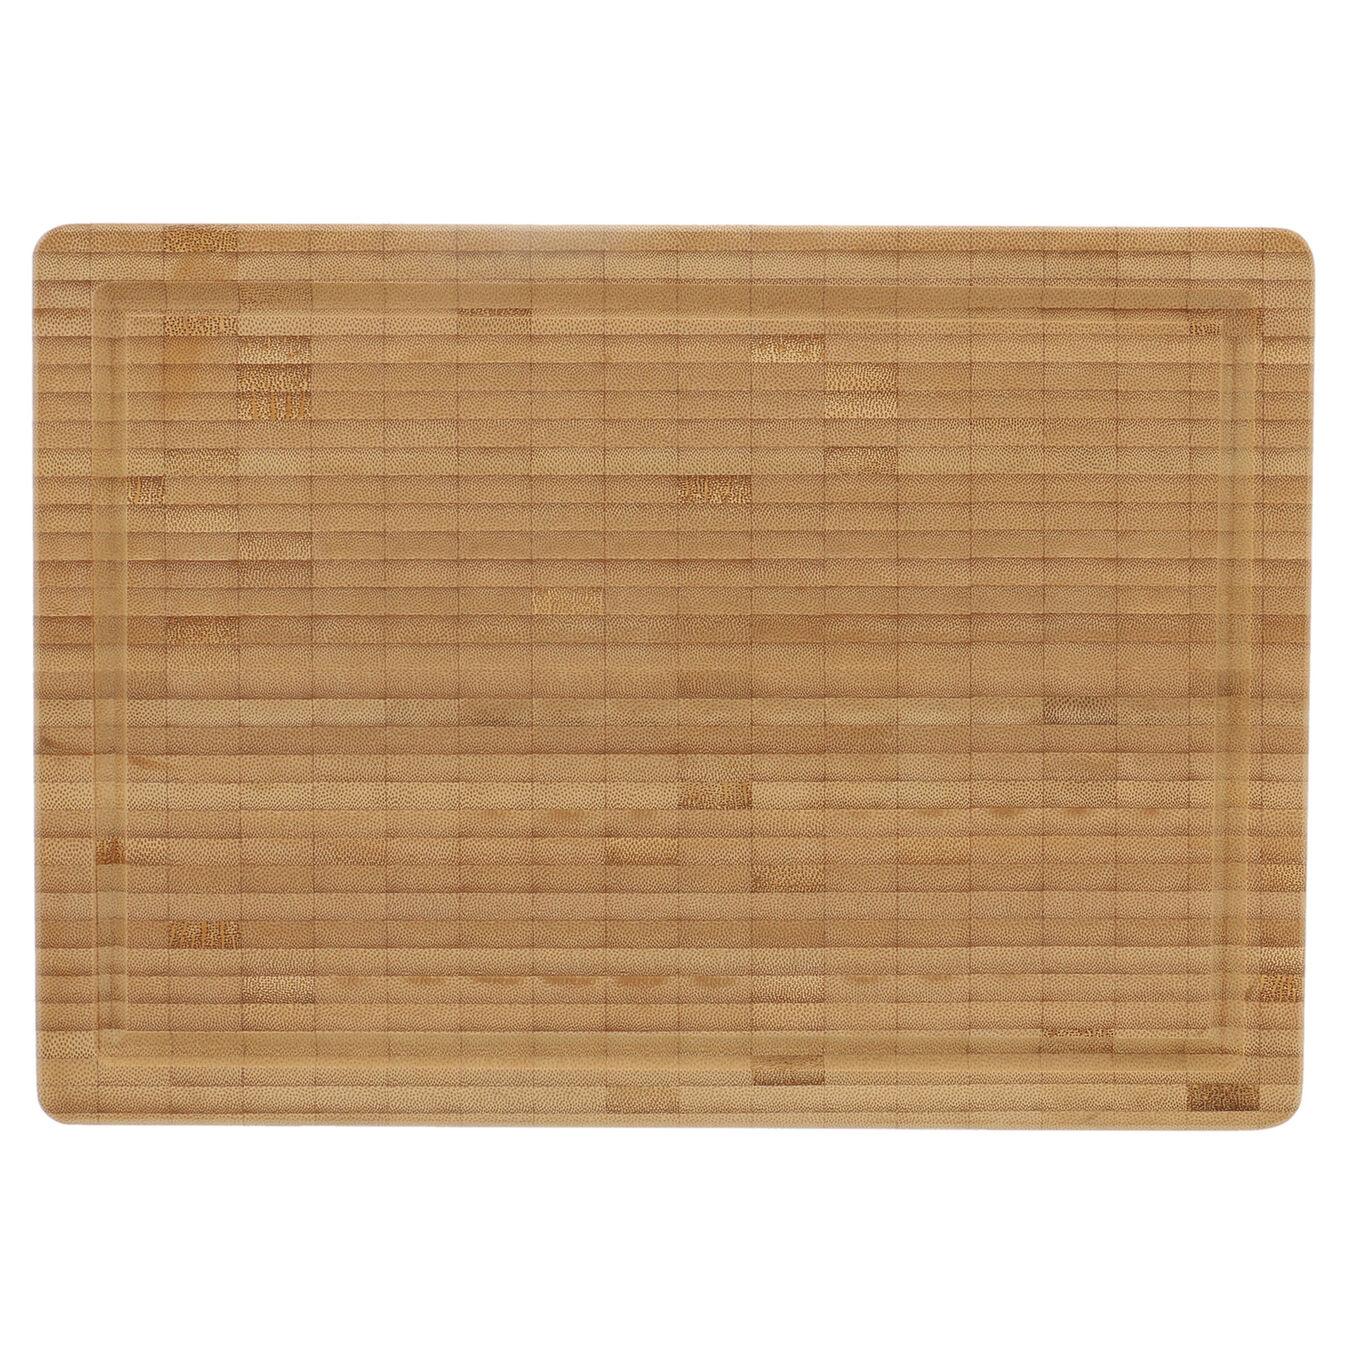 Tagliere - 36 cm x 25 cm, bamb,,large 5